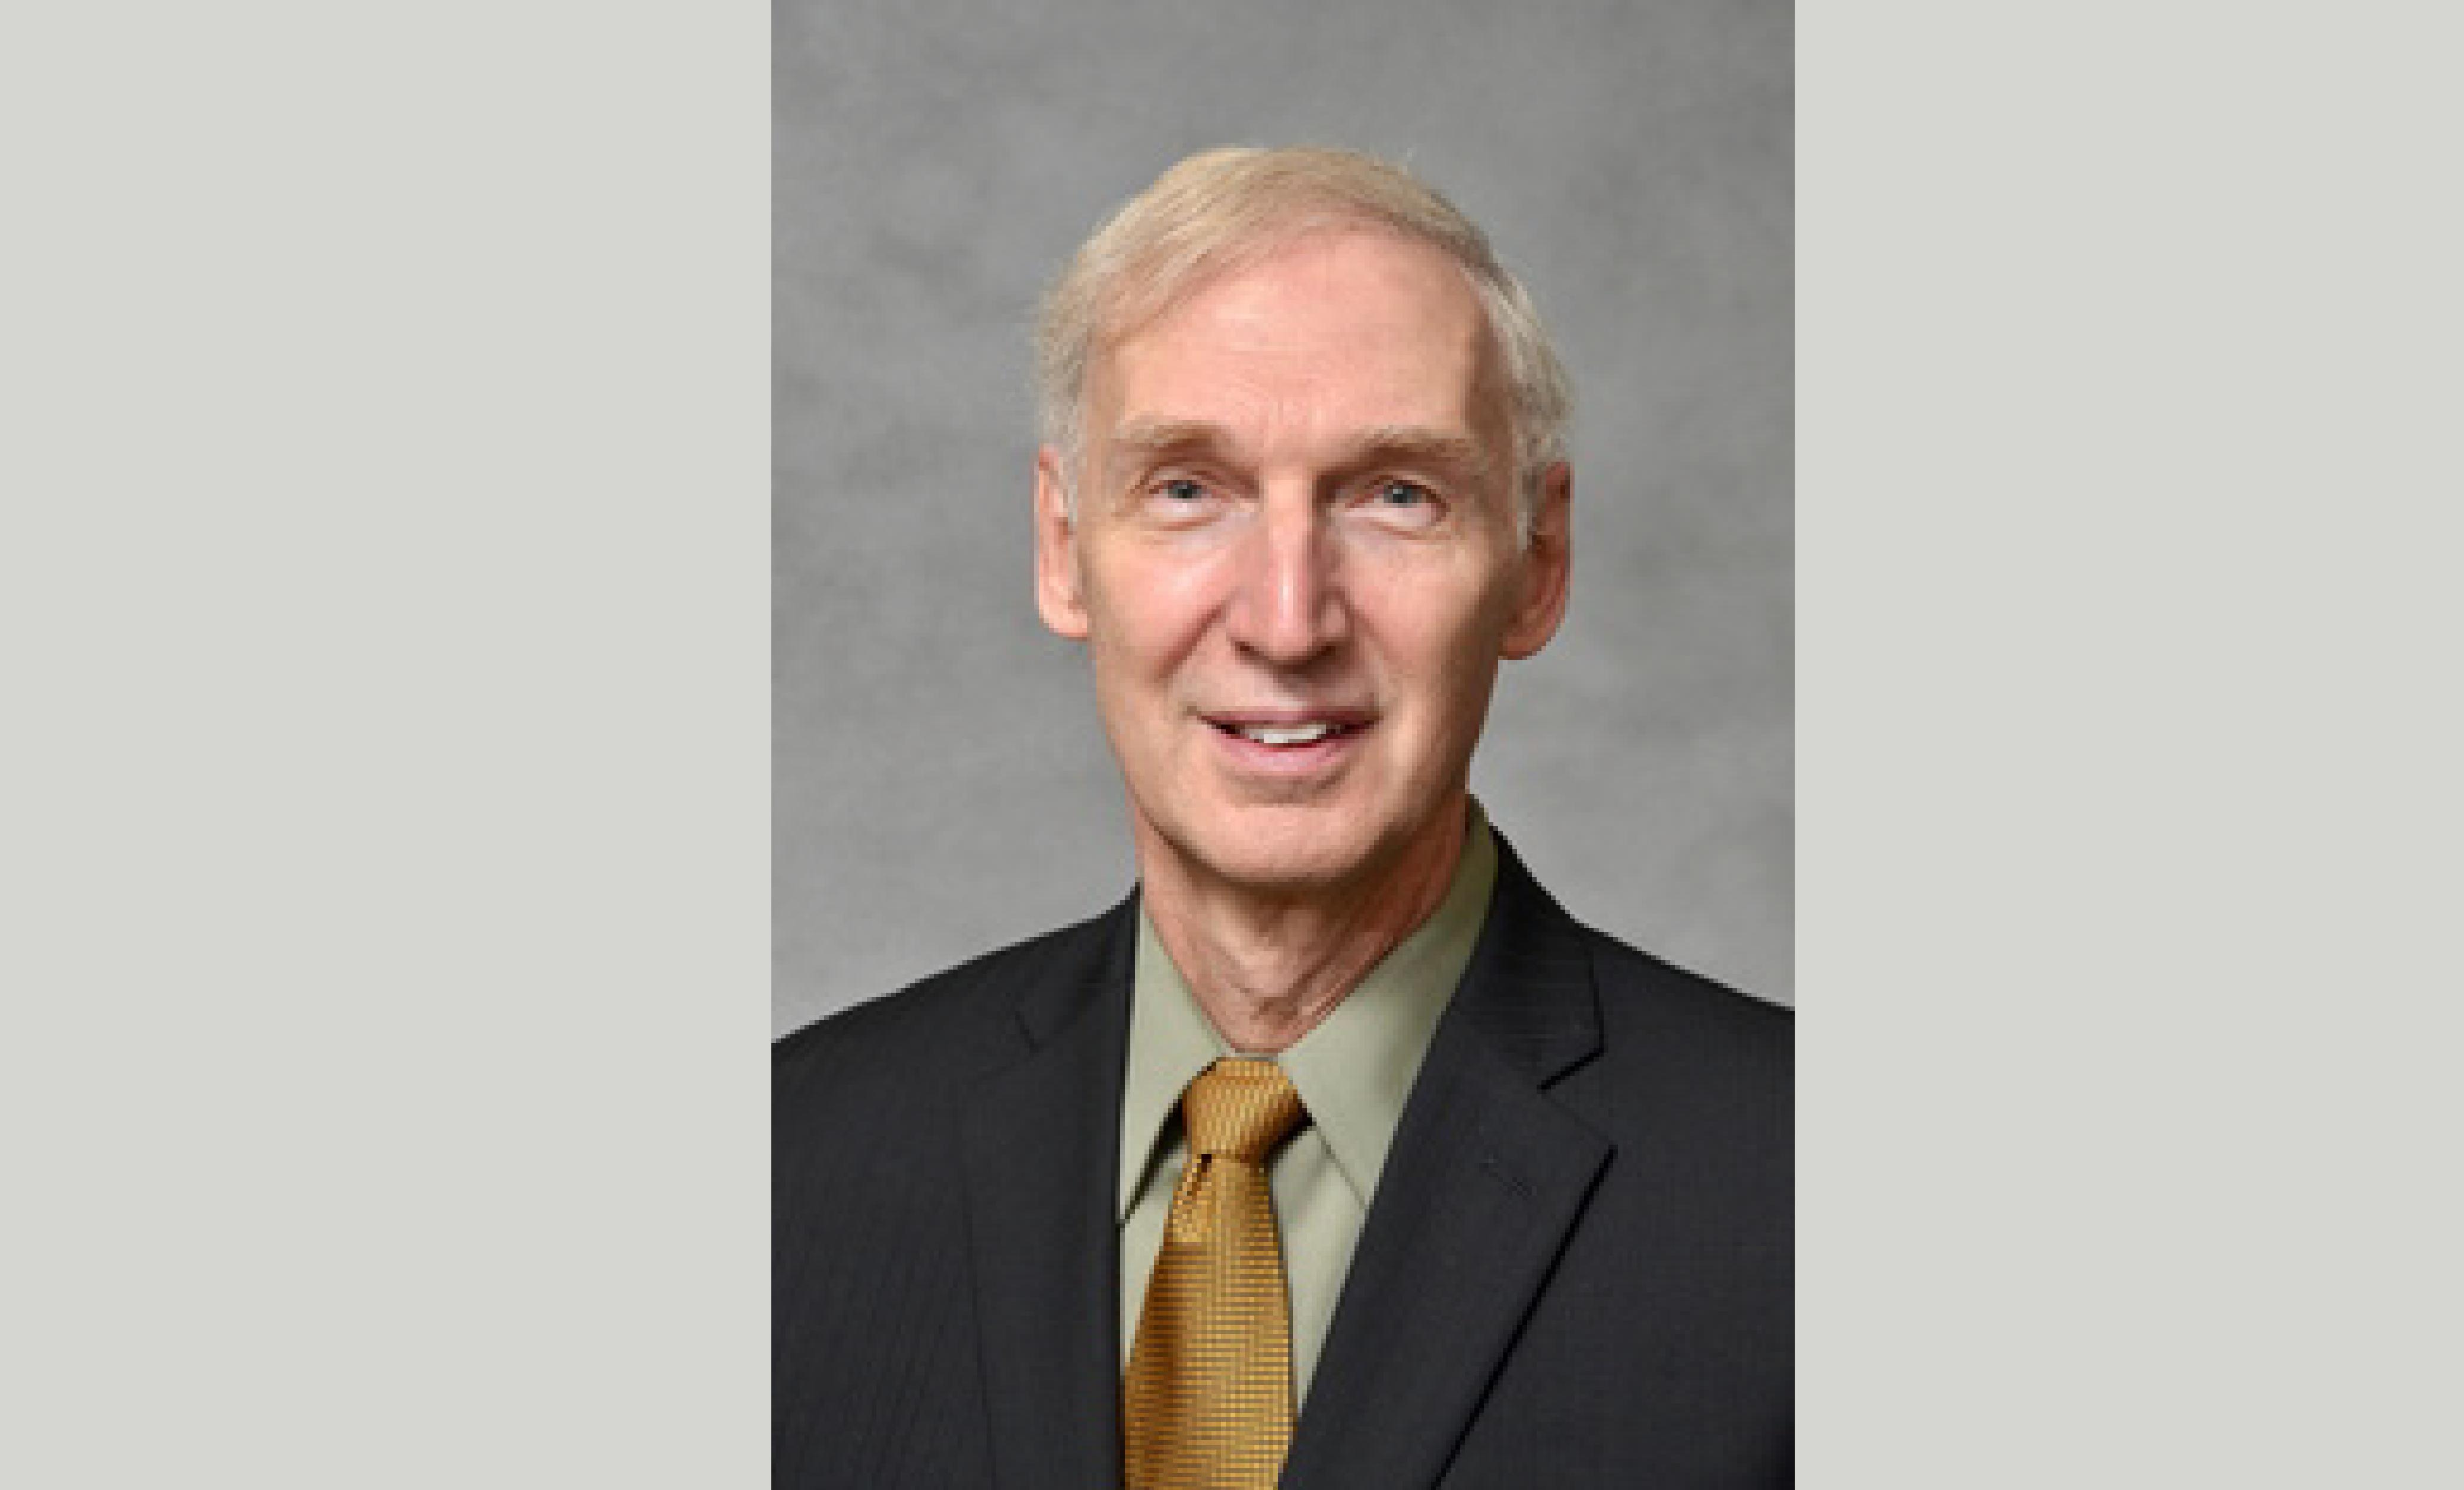 Dr. Richard Prielipp